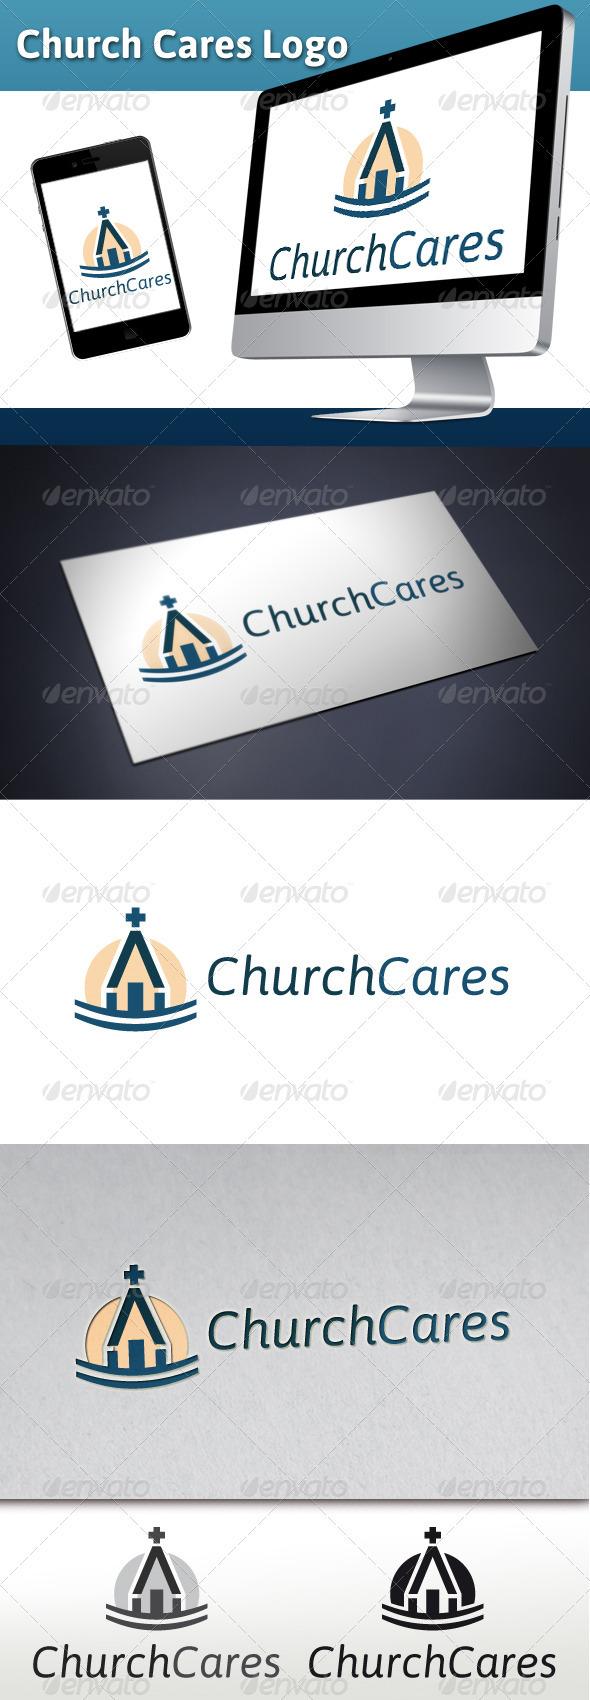 Church Cares Charity Logo - Buildings Logo Templates